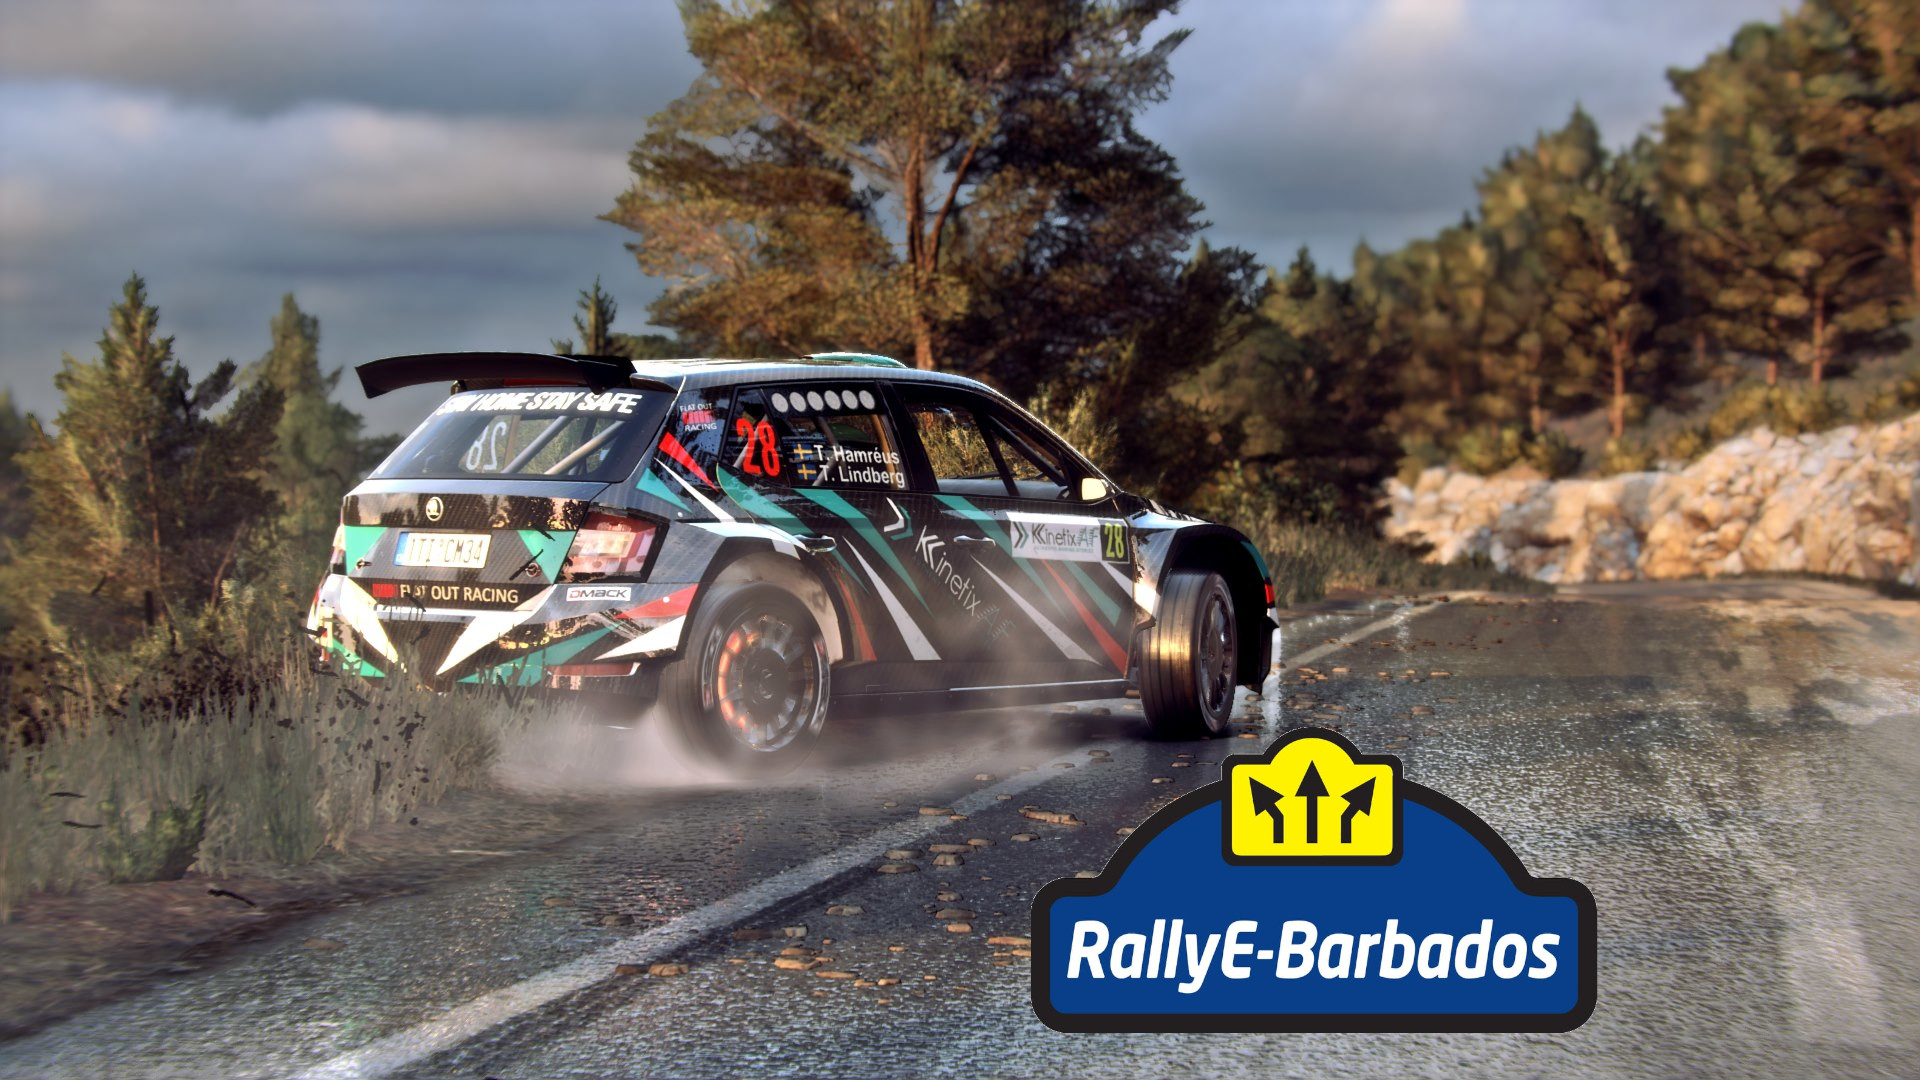 CRC Rally Championship – Round 8 – RallyE-Barbados 2021 – Results